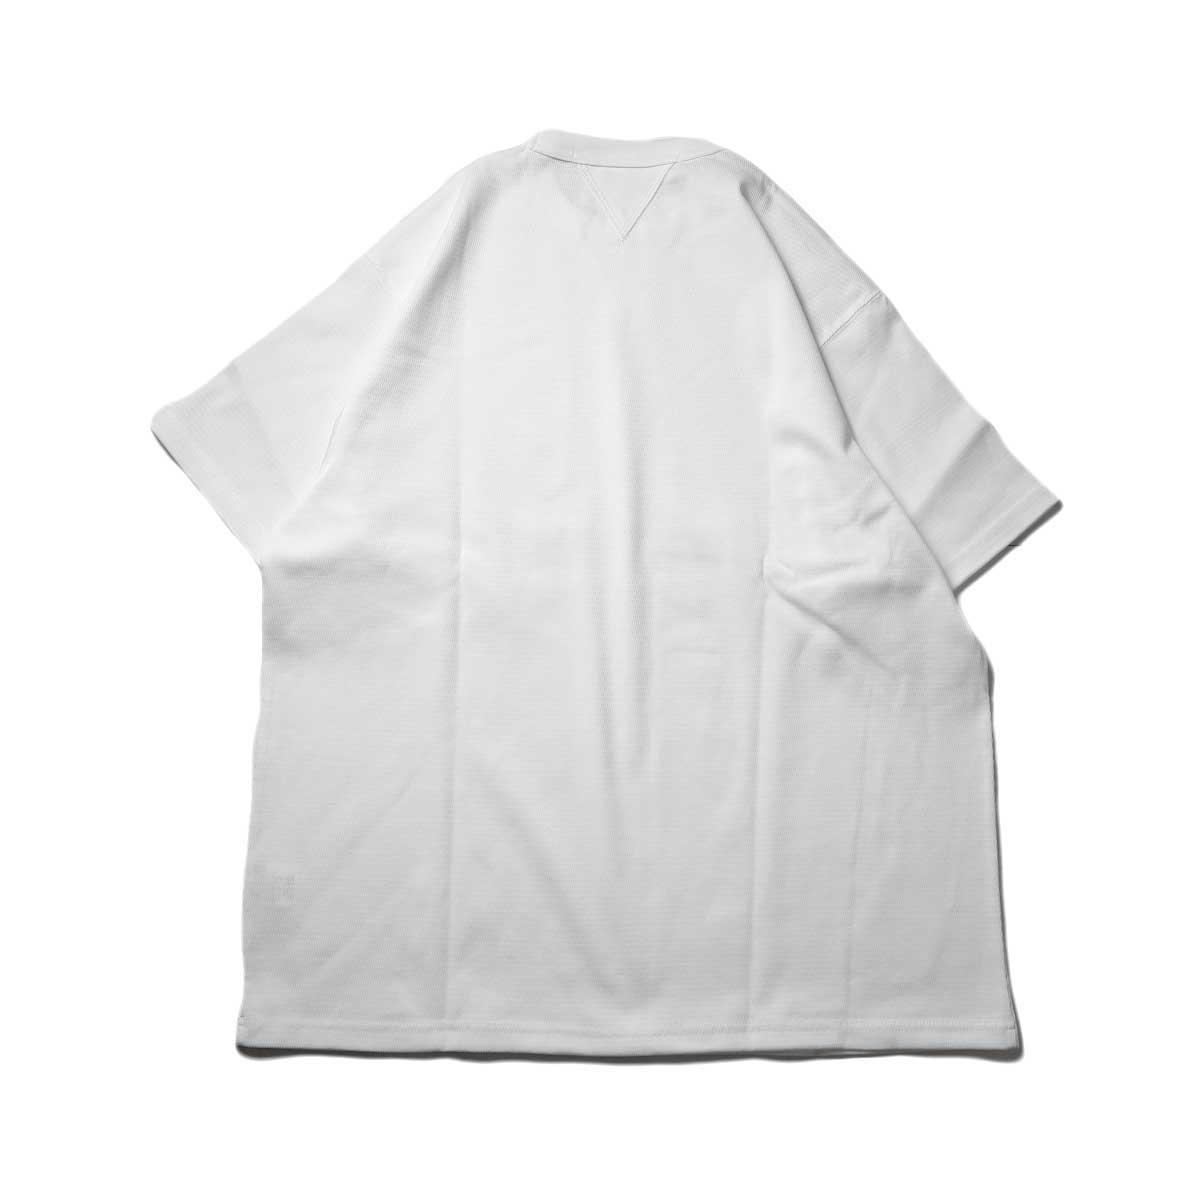 FUTURE PRIMITIVE / FP THERMAL V T-SHIRT (White)背面